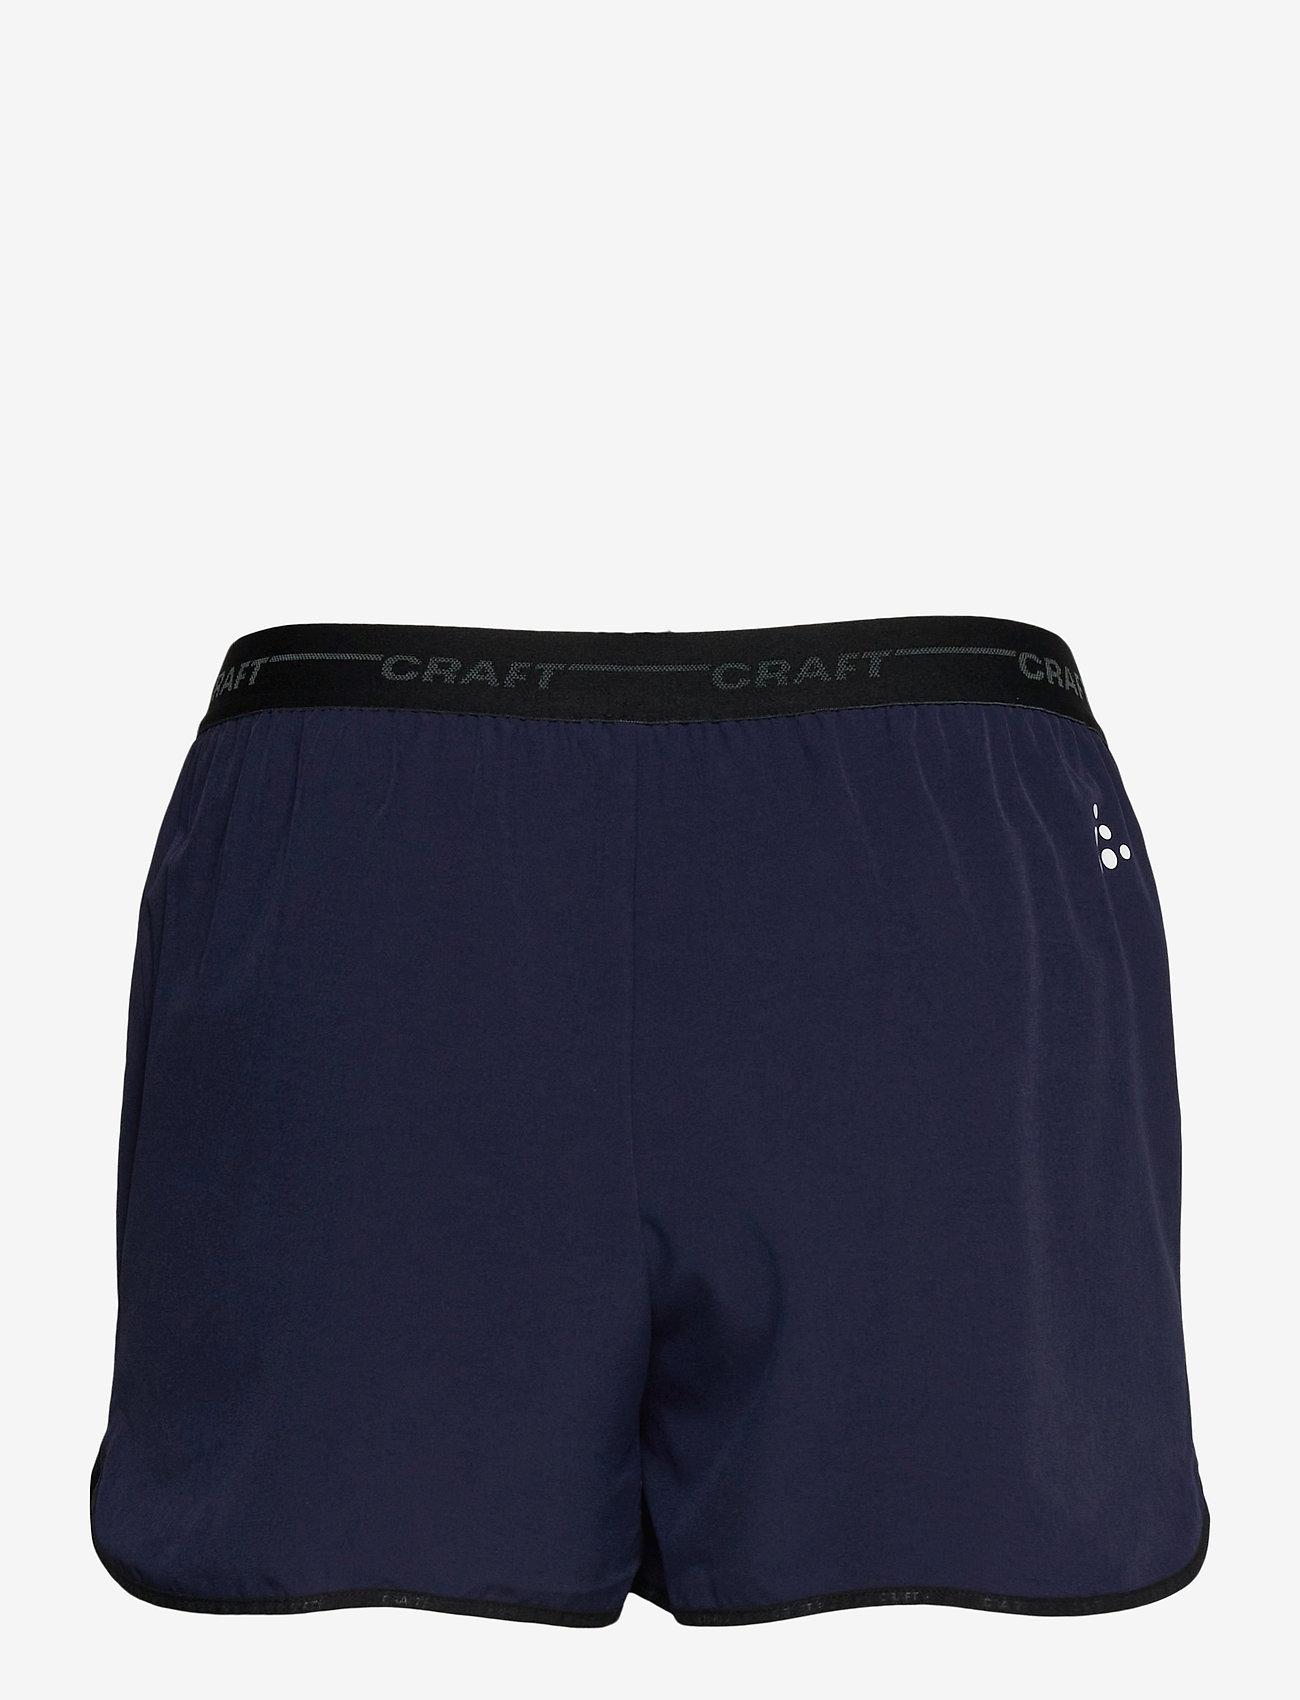 Craft - Pro Control Impact Shorts W - training korte broek - navy/white - 1